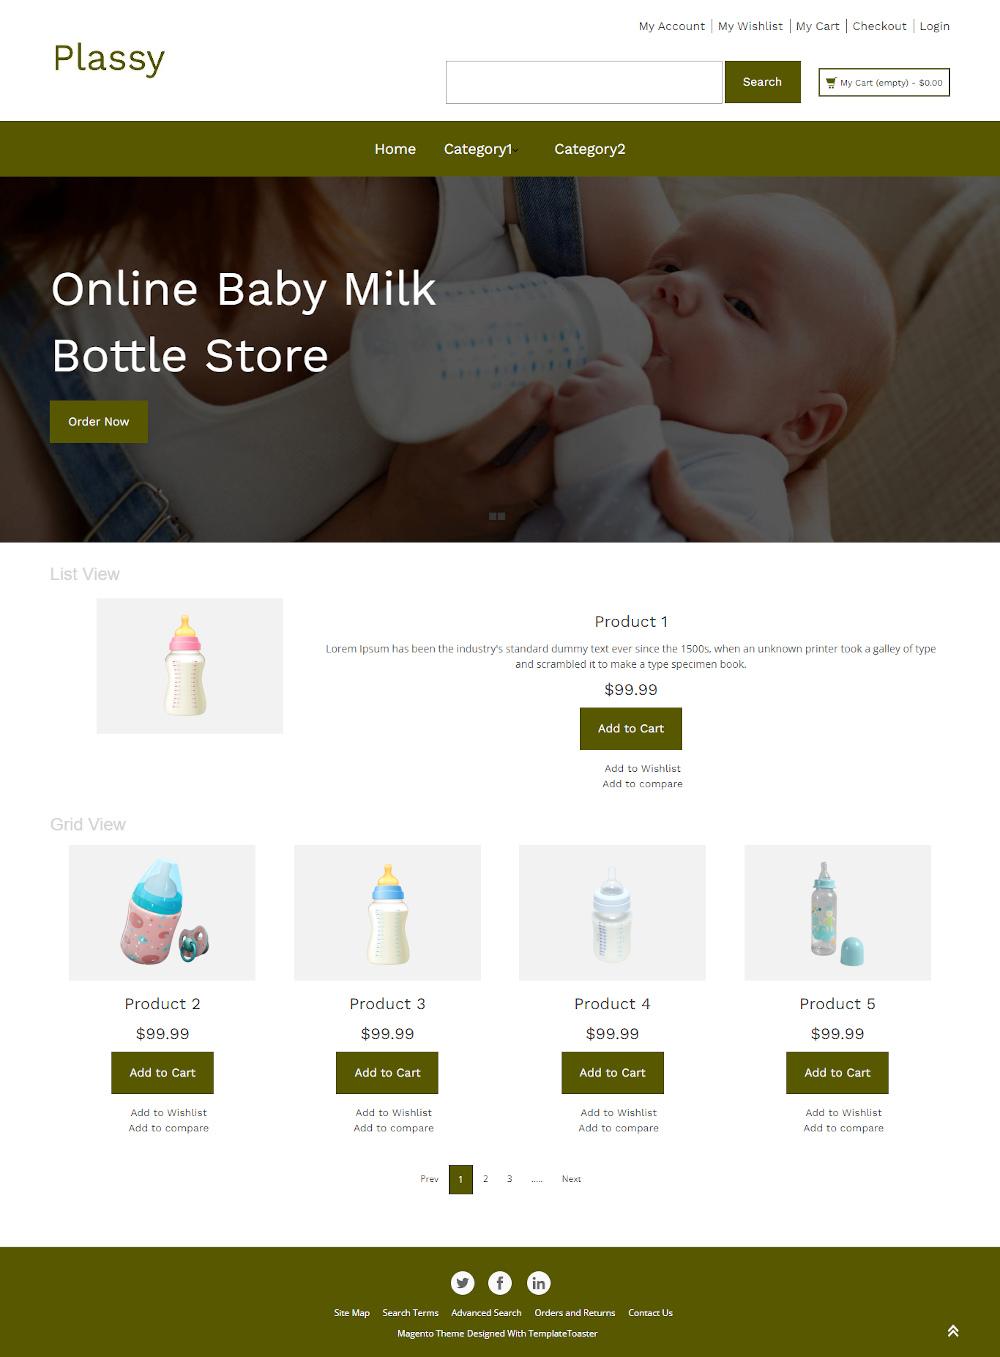 Plassy - Online Baby Milk Bottle Store Magento Theme